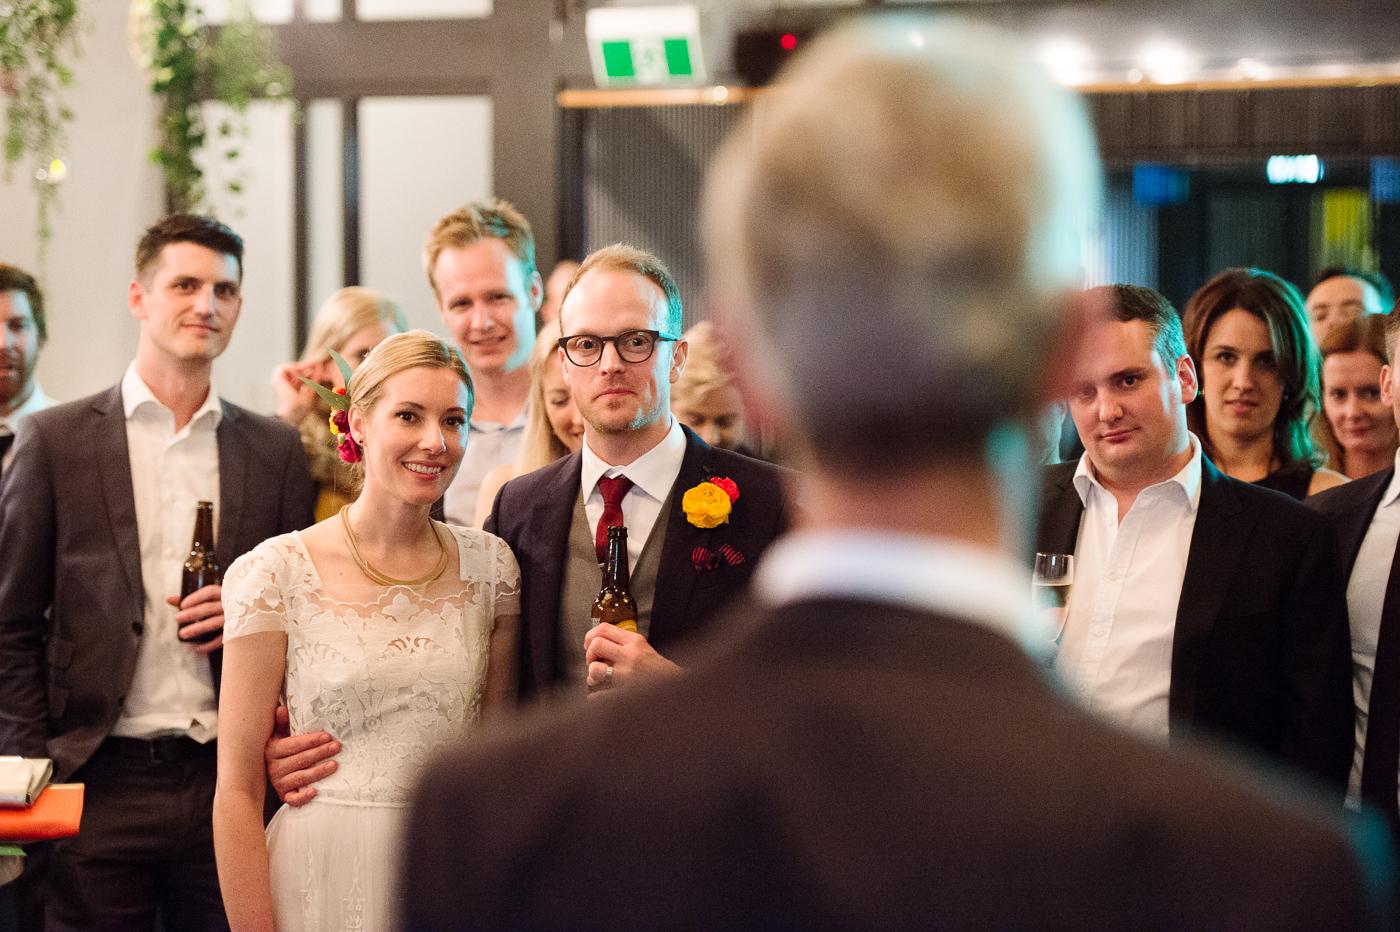 Fitzroy-townhall-wedding-photos-281